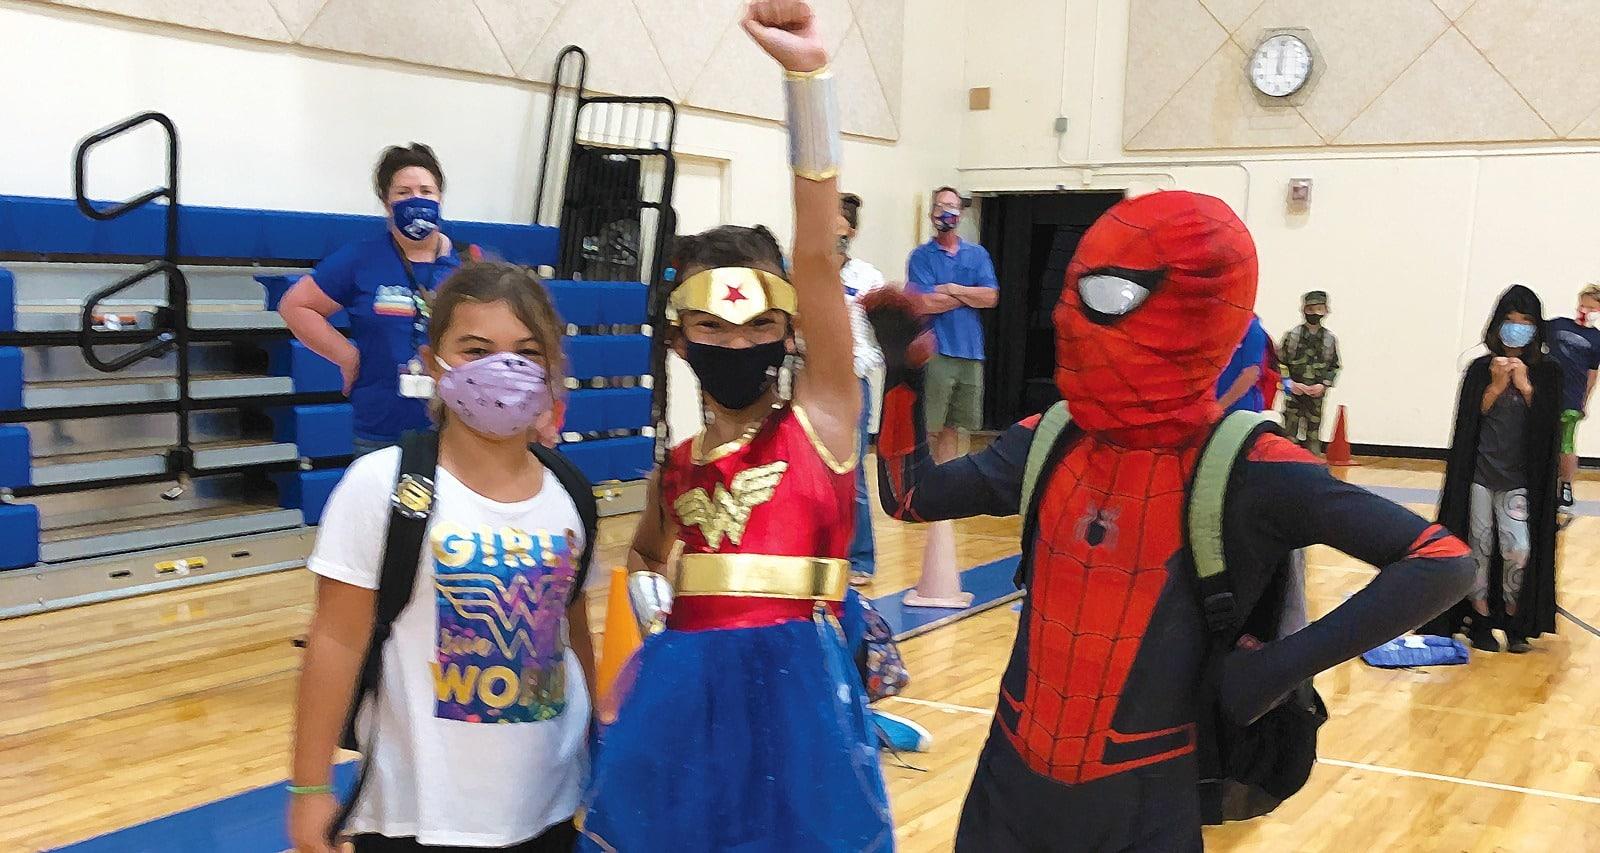 3 kids in costume wearing masks